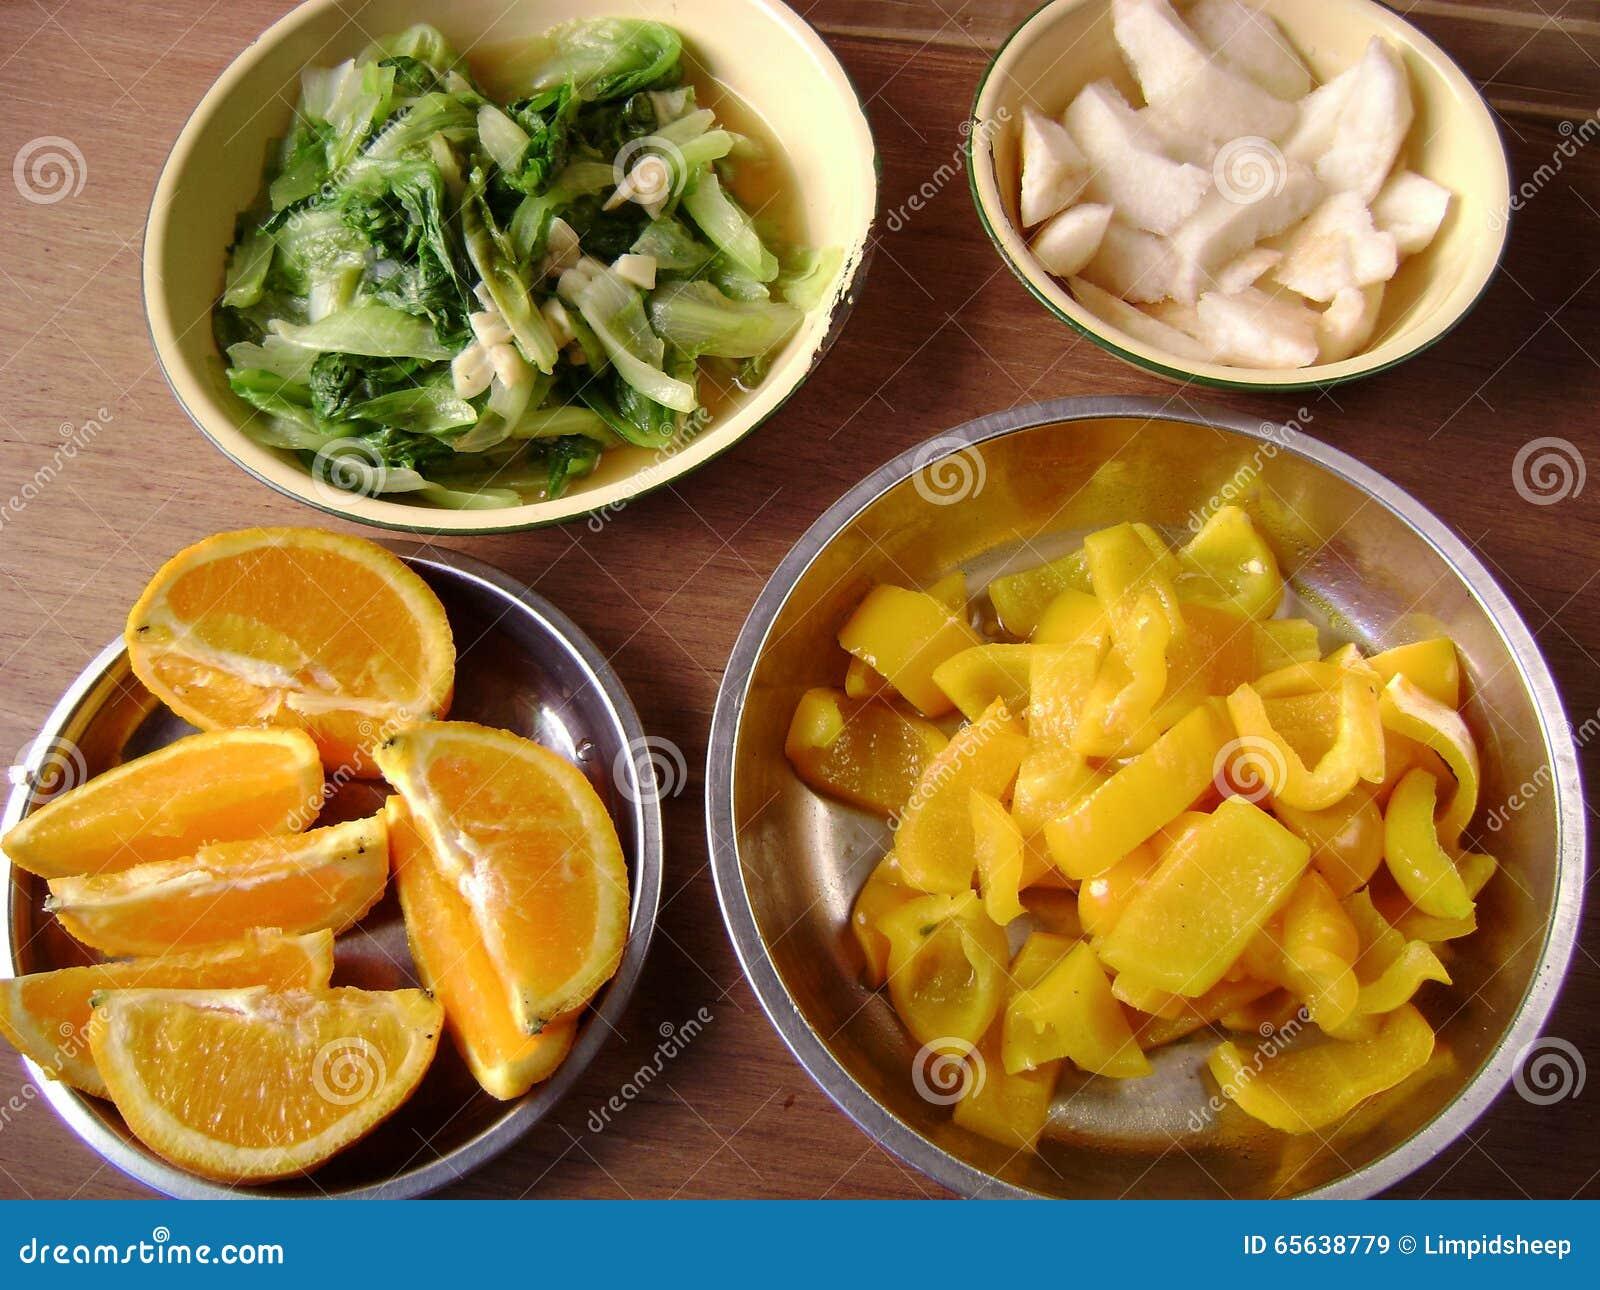 Nourriture végétarienne faite maison chinoise